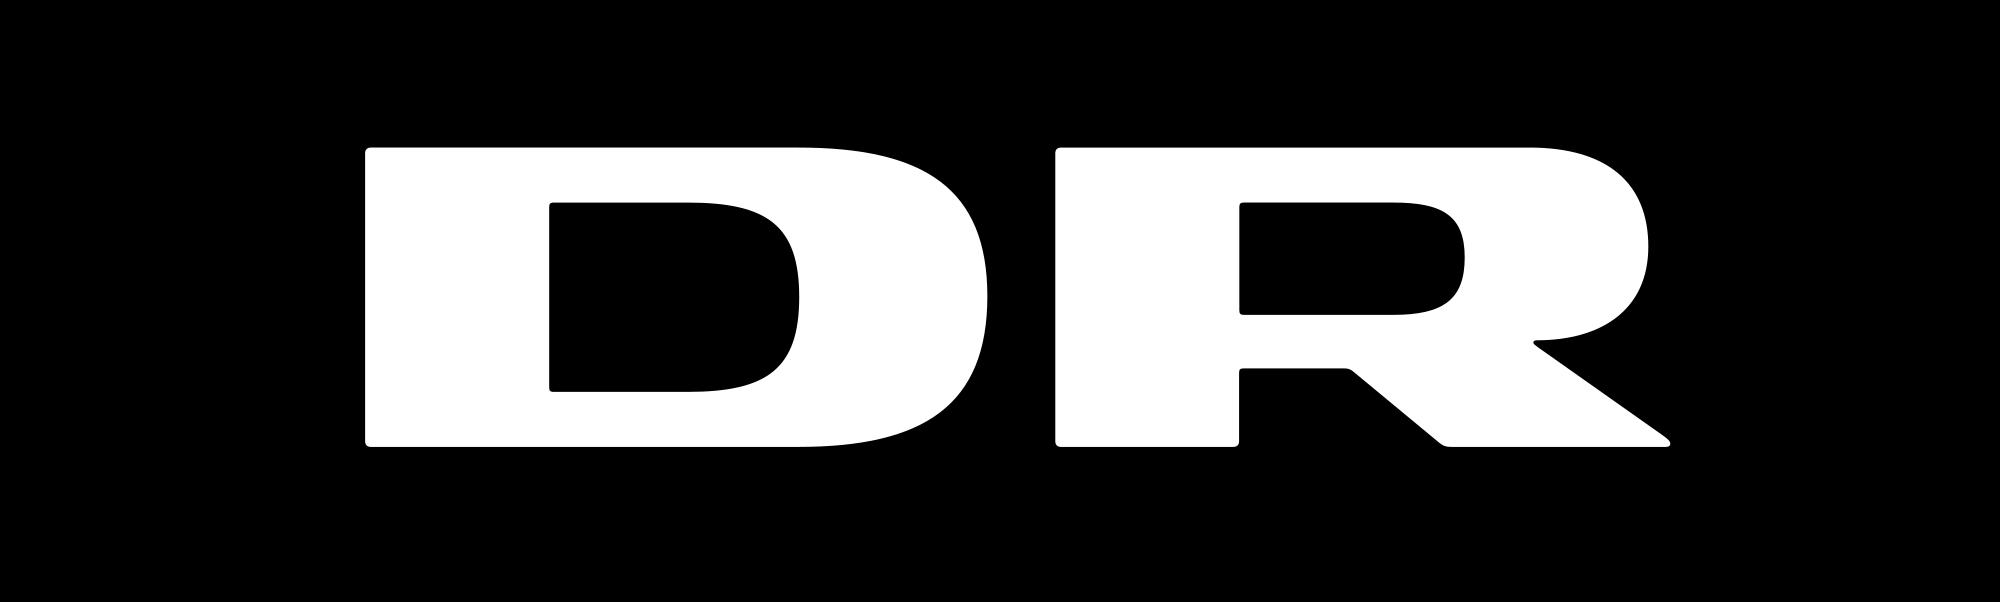 Danmarks Radio (DR)